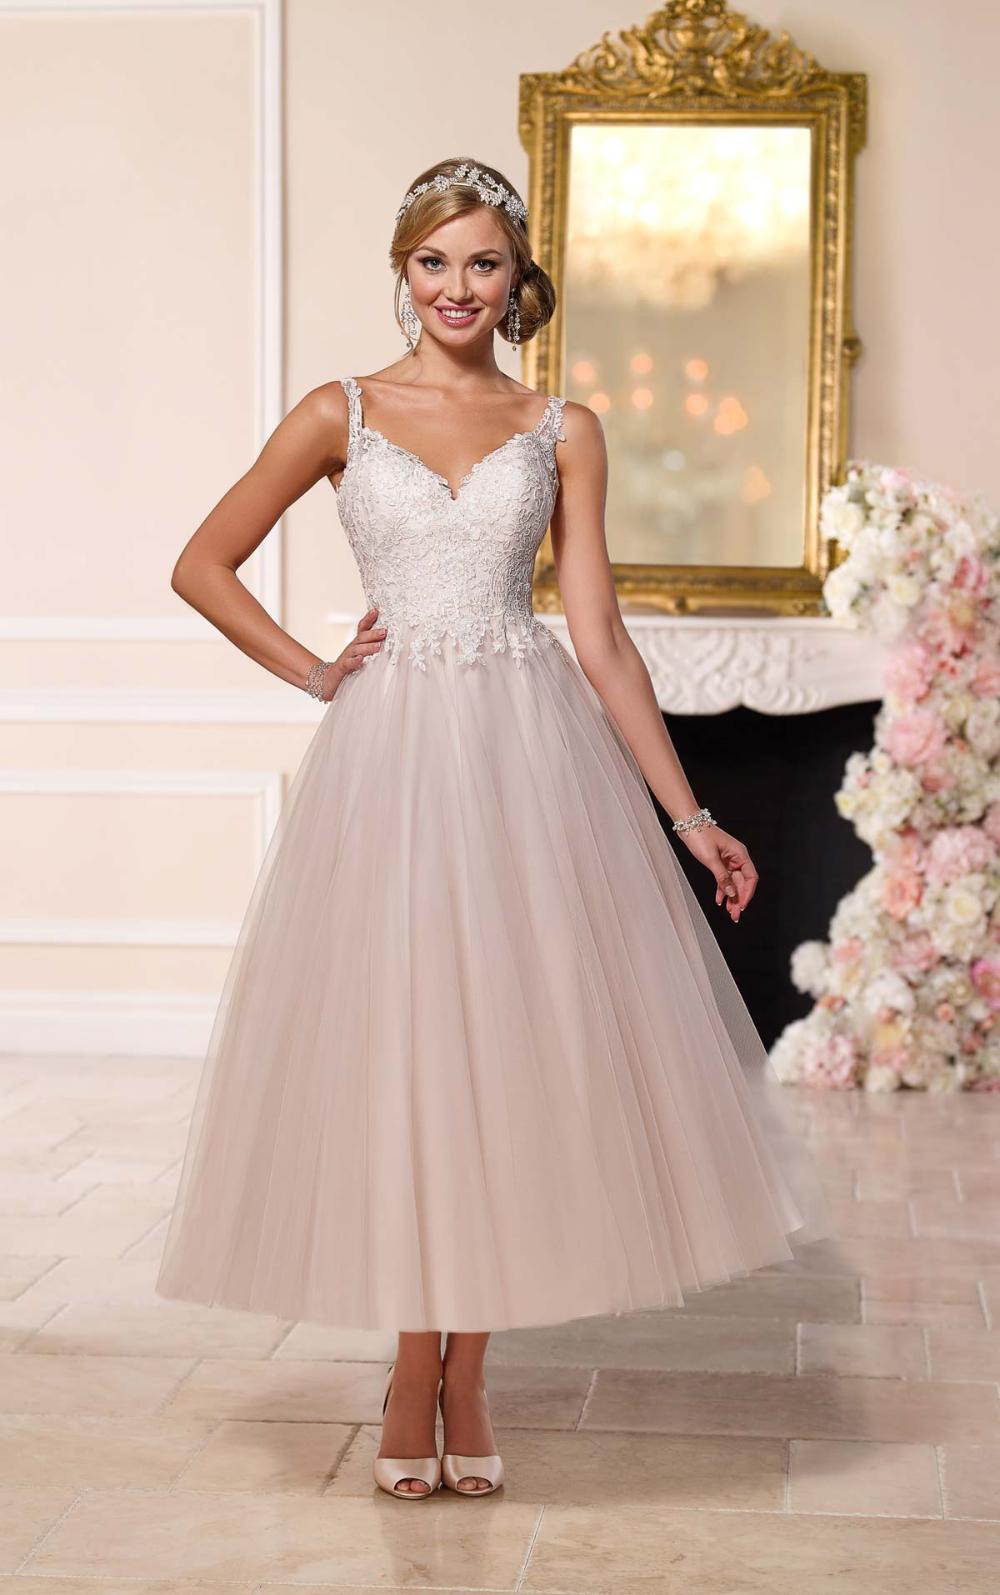 Tee-Länge Brautkleid mit Tüllrock | Stella York Brautkleider